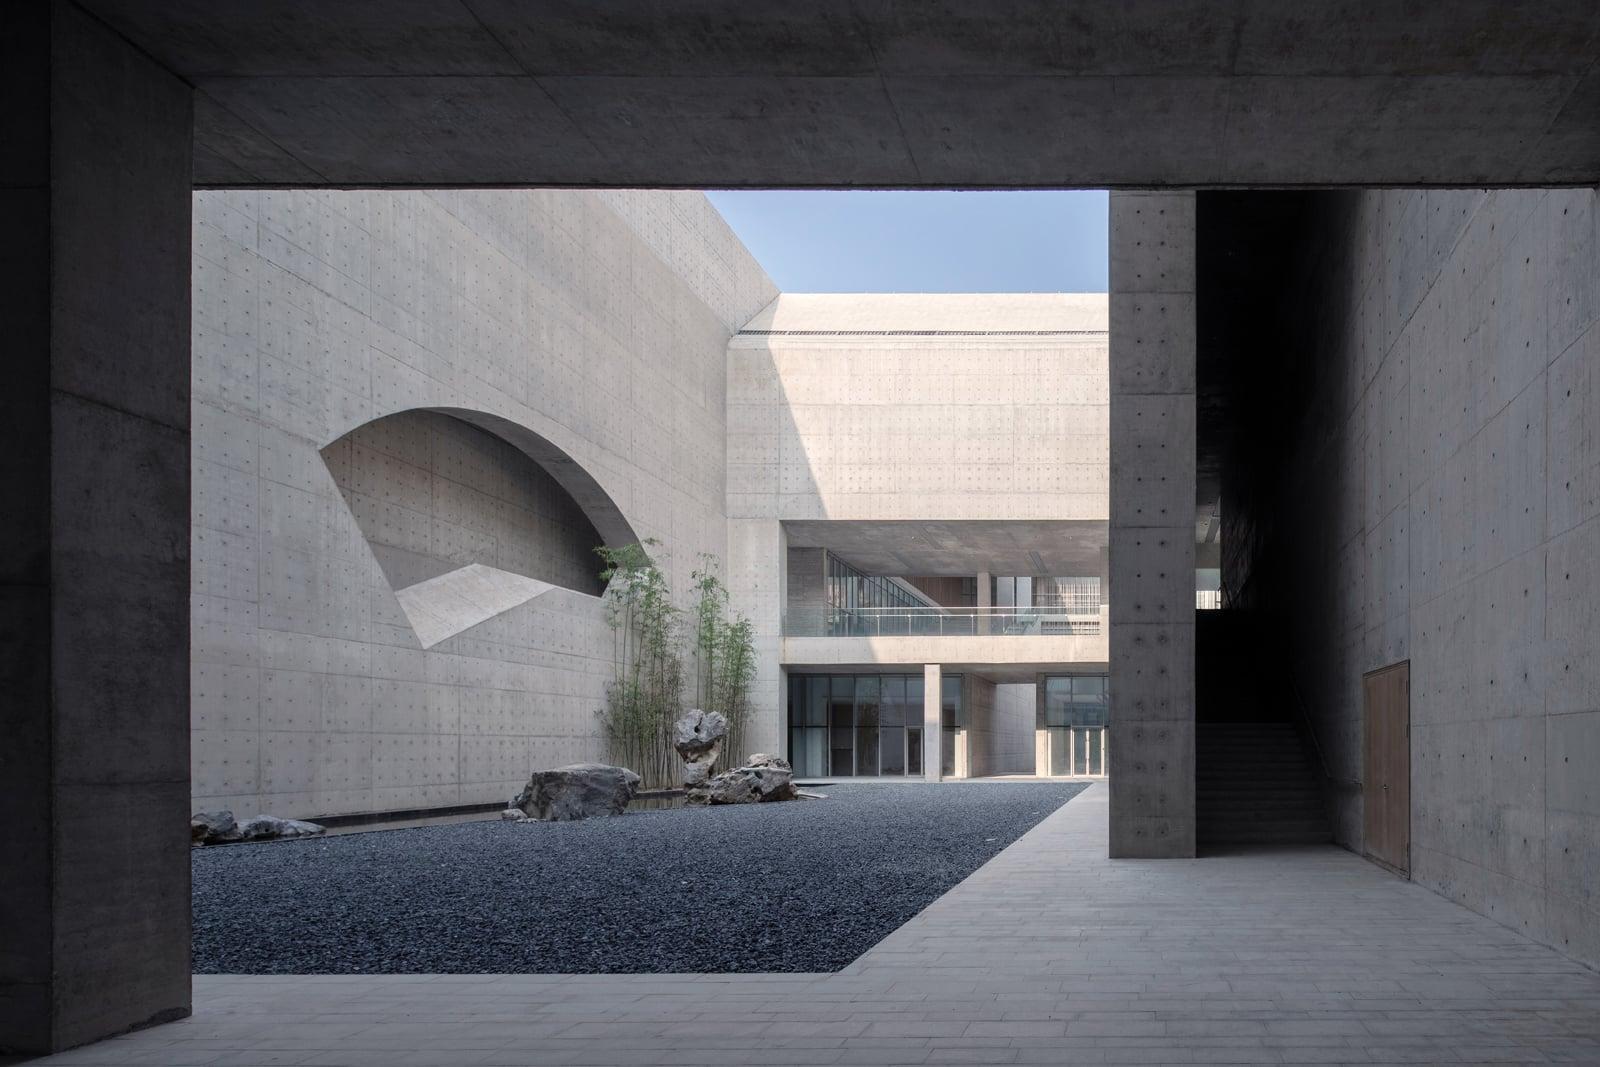 Shou County Culture and Art Center  - 20210702 Zhu Pei ShouCountyCultureArtCenter 08 47